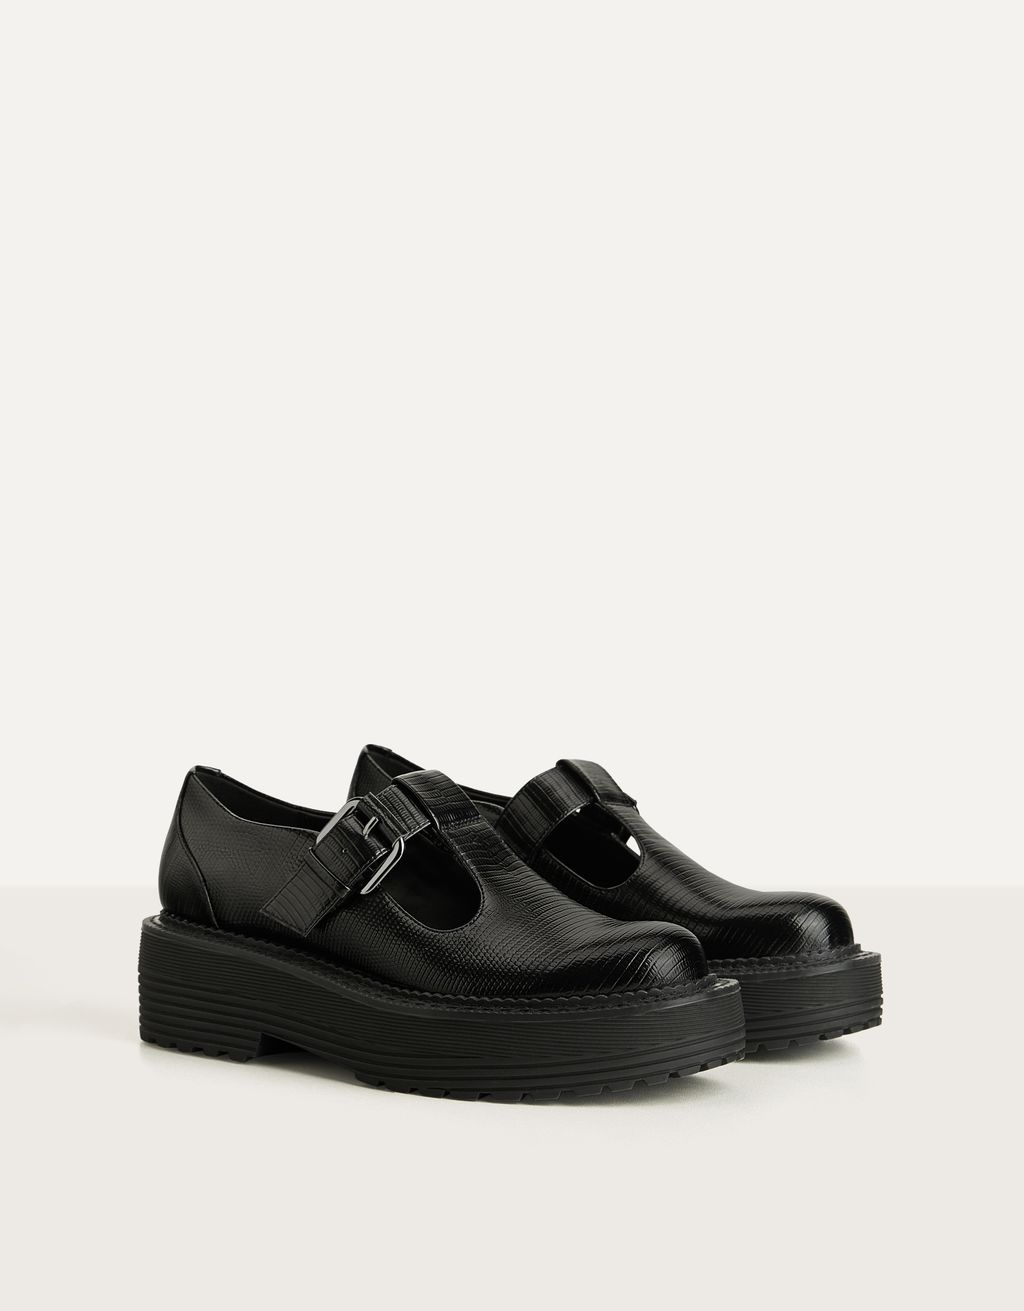 Flat platform shoes